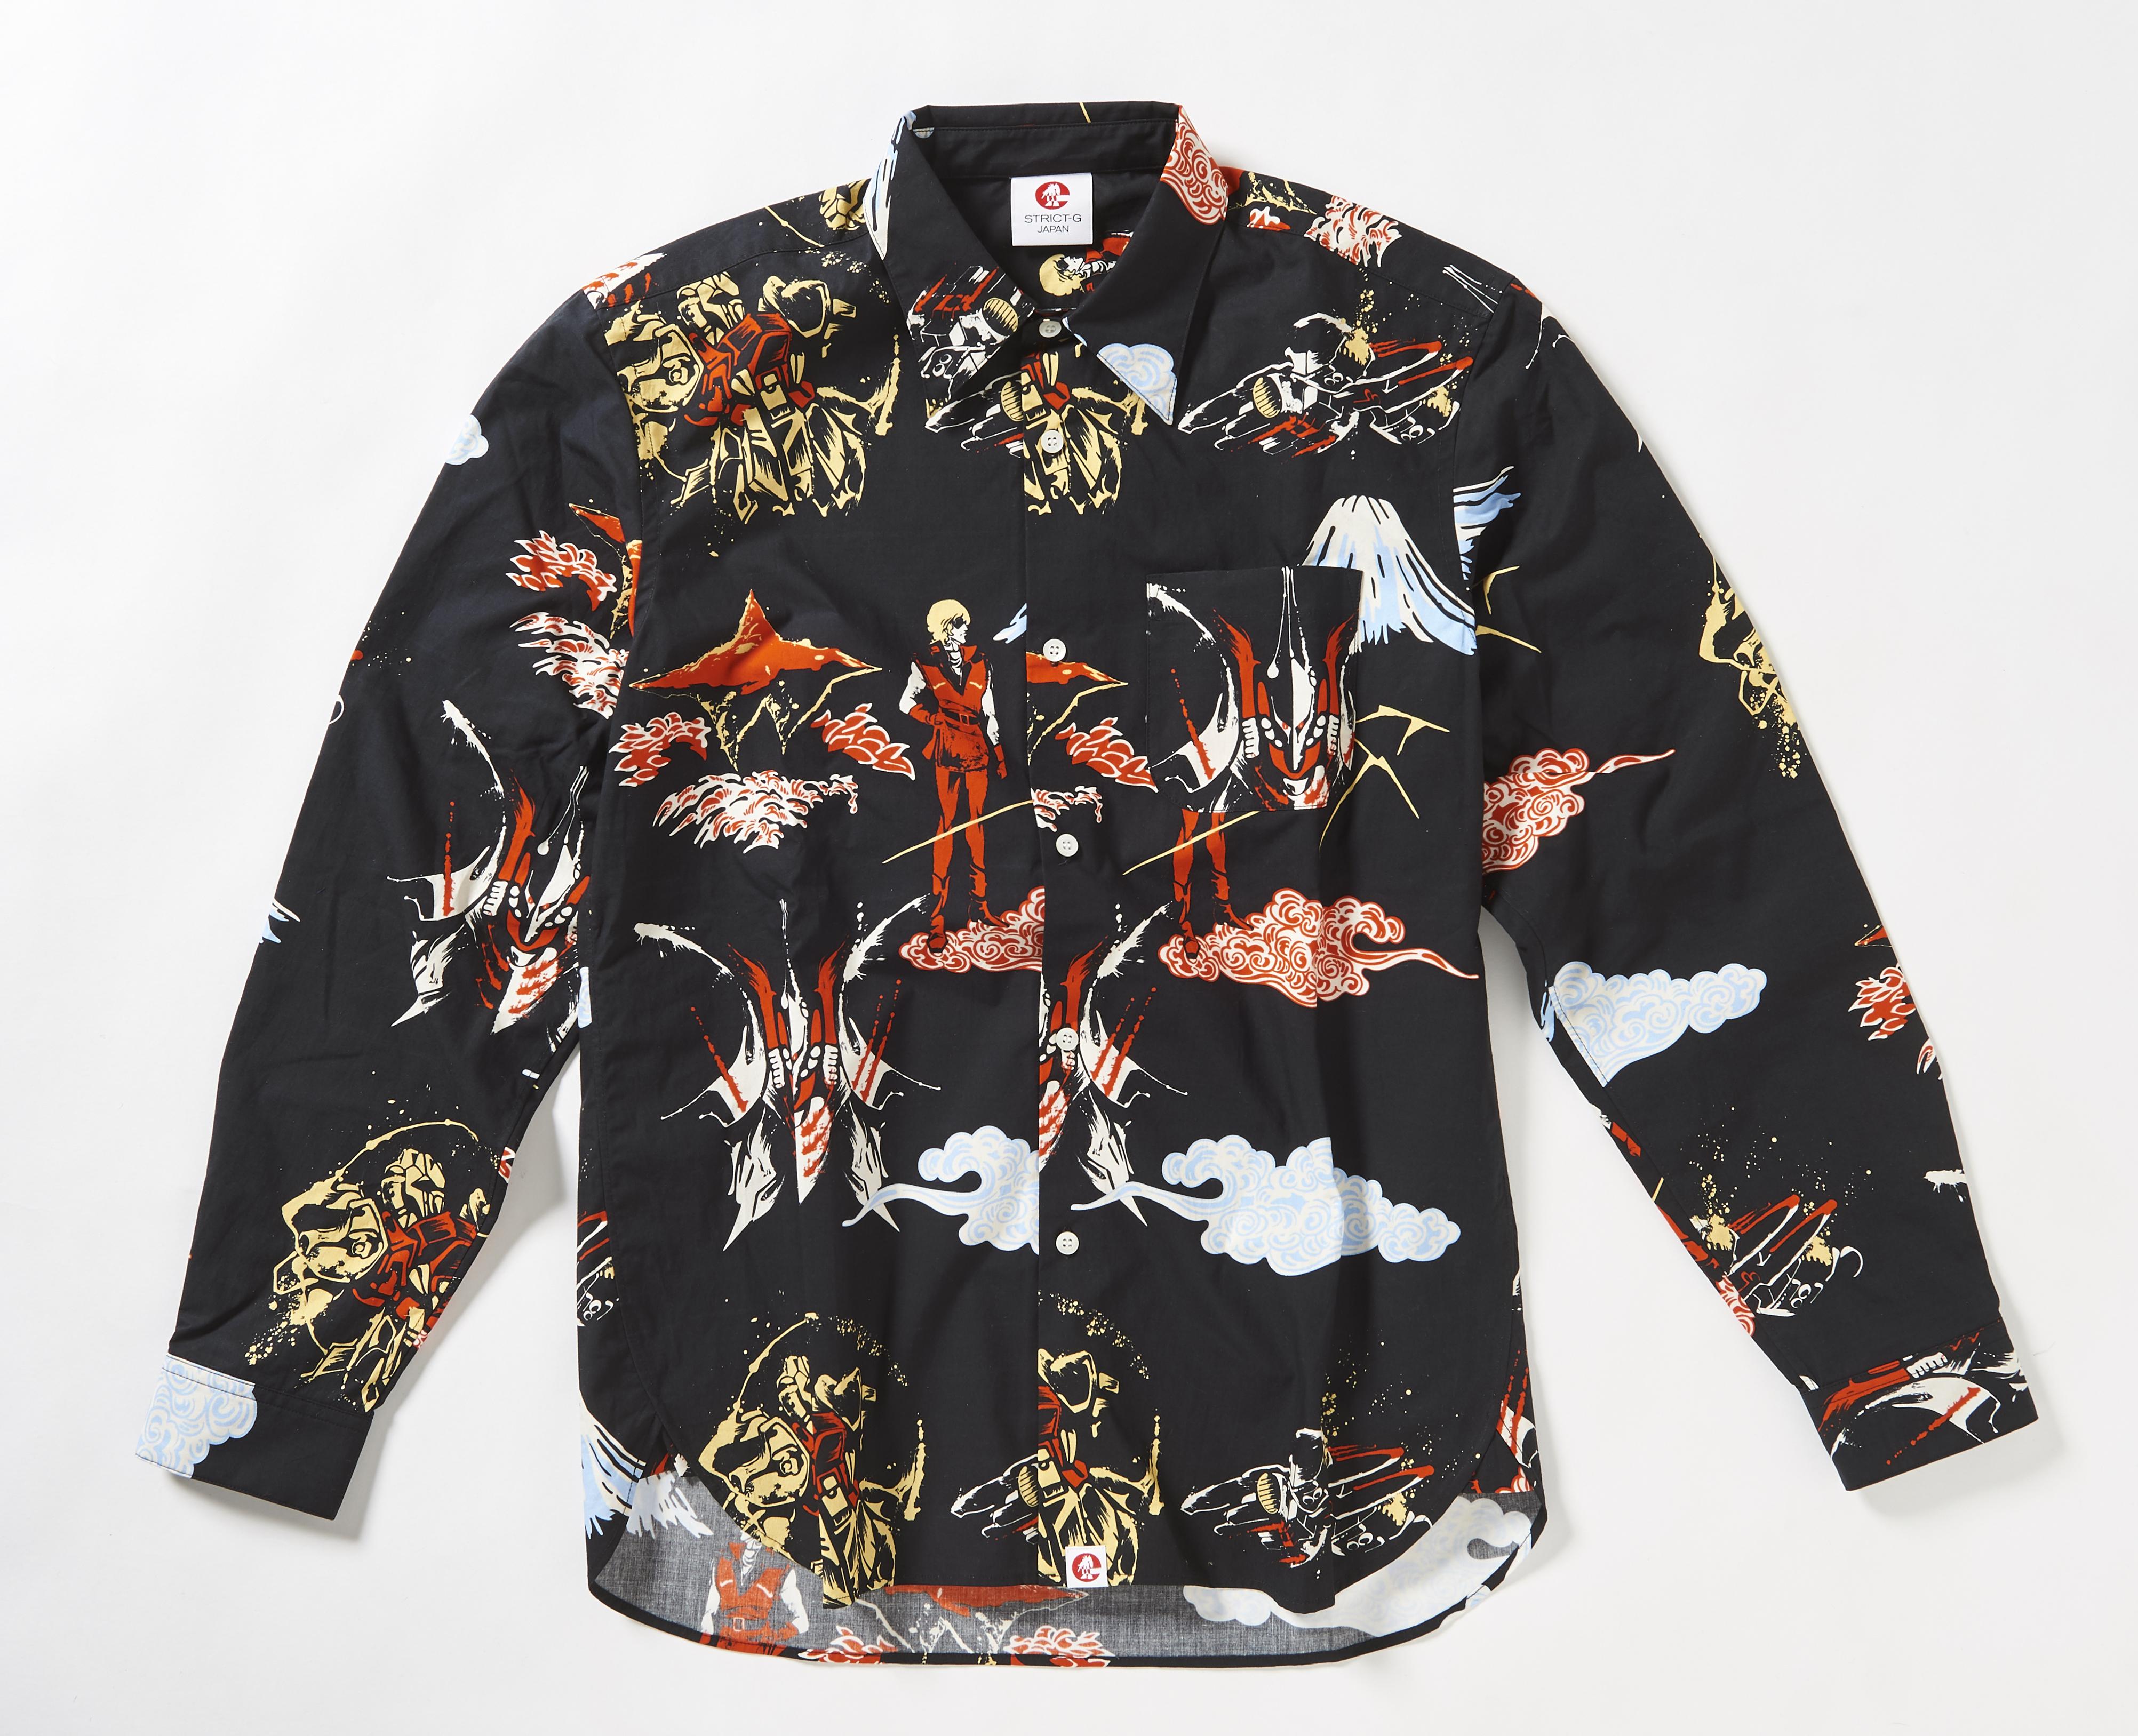 STRICT-G JAPAN 「Z GUNDAM」 Collor shirts Hyaku-Shiki & Qubeley